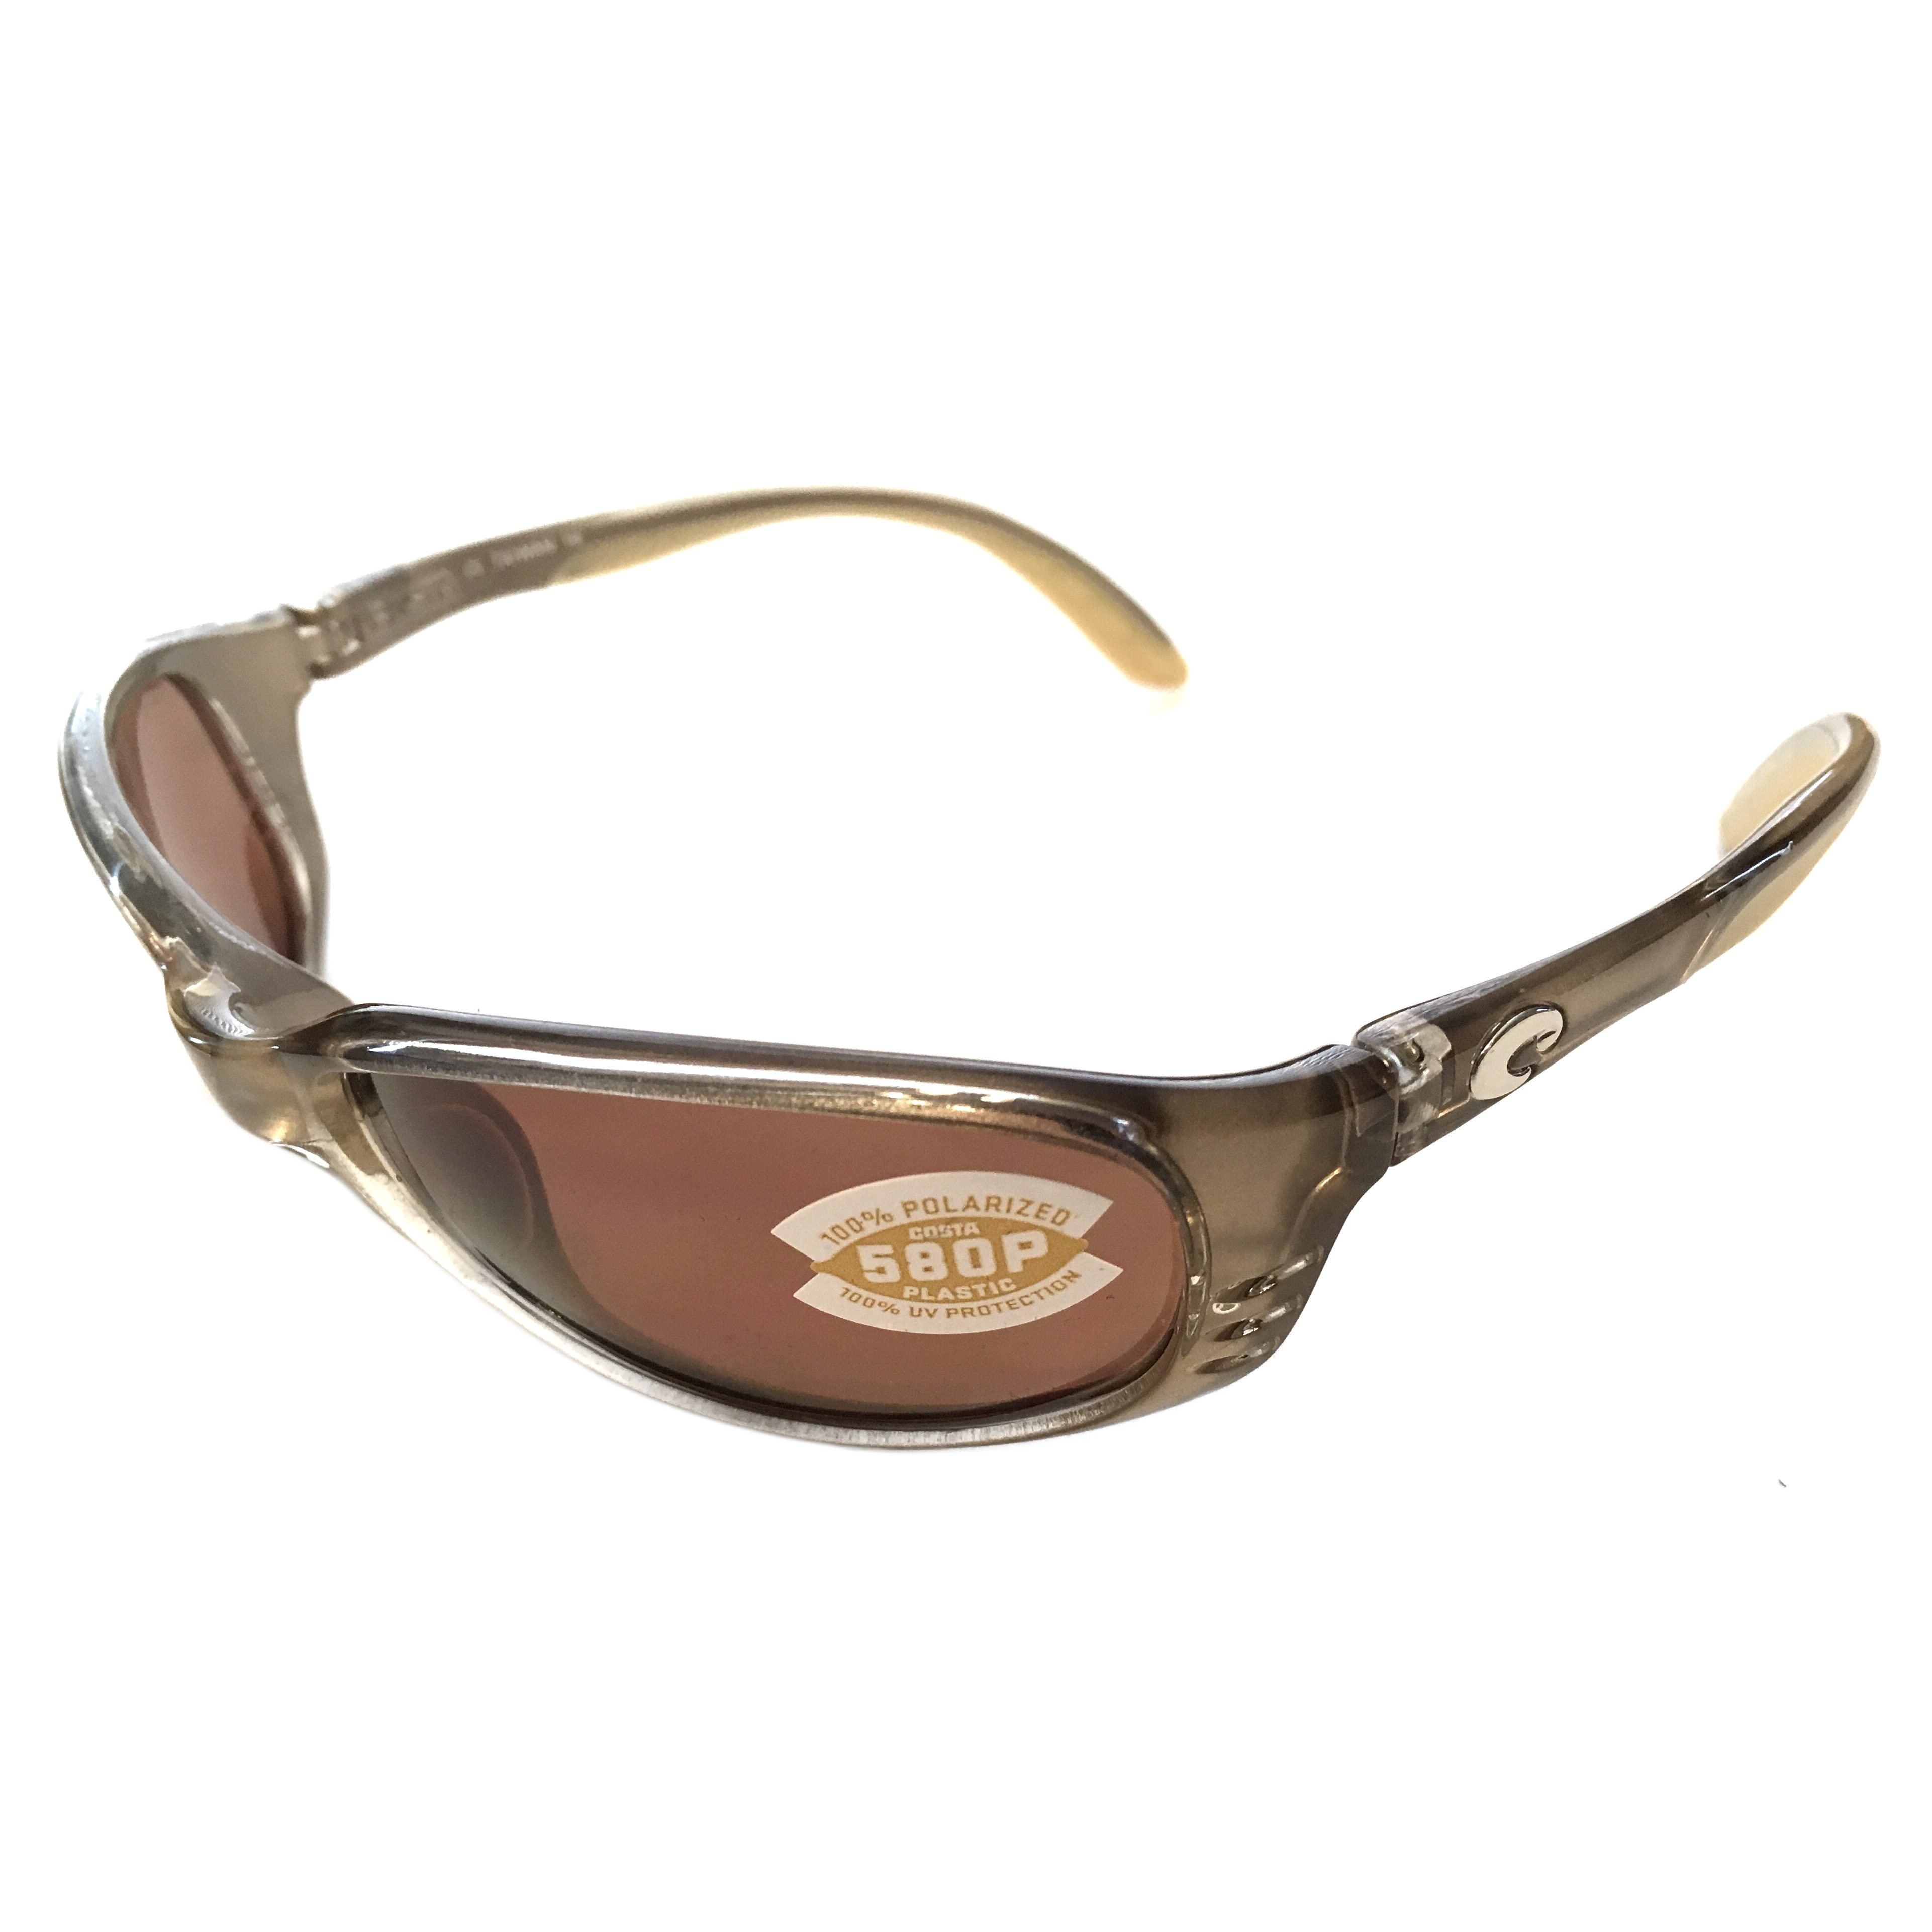 7c6a21674db72 Costa Del Mar Brine Sunglasses – Crystal Bronze Frame – Polarized Copper  Lens 580P